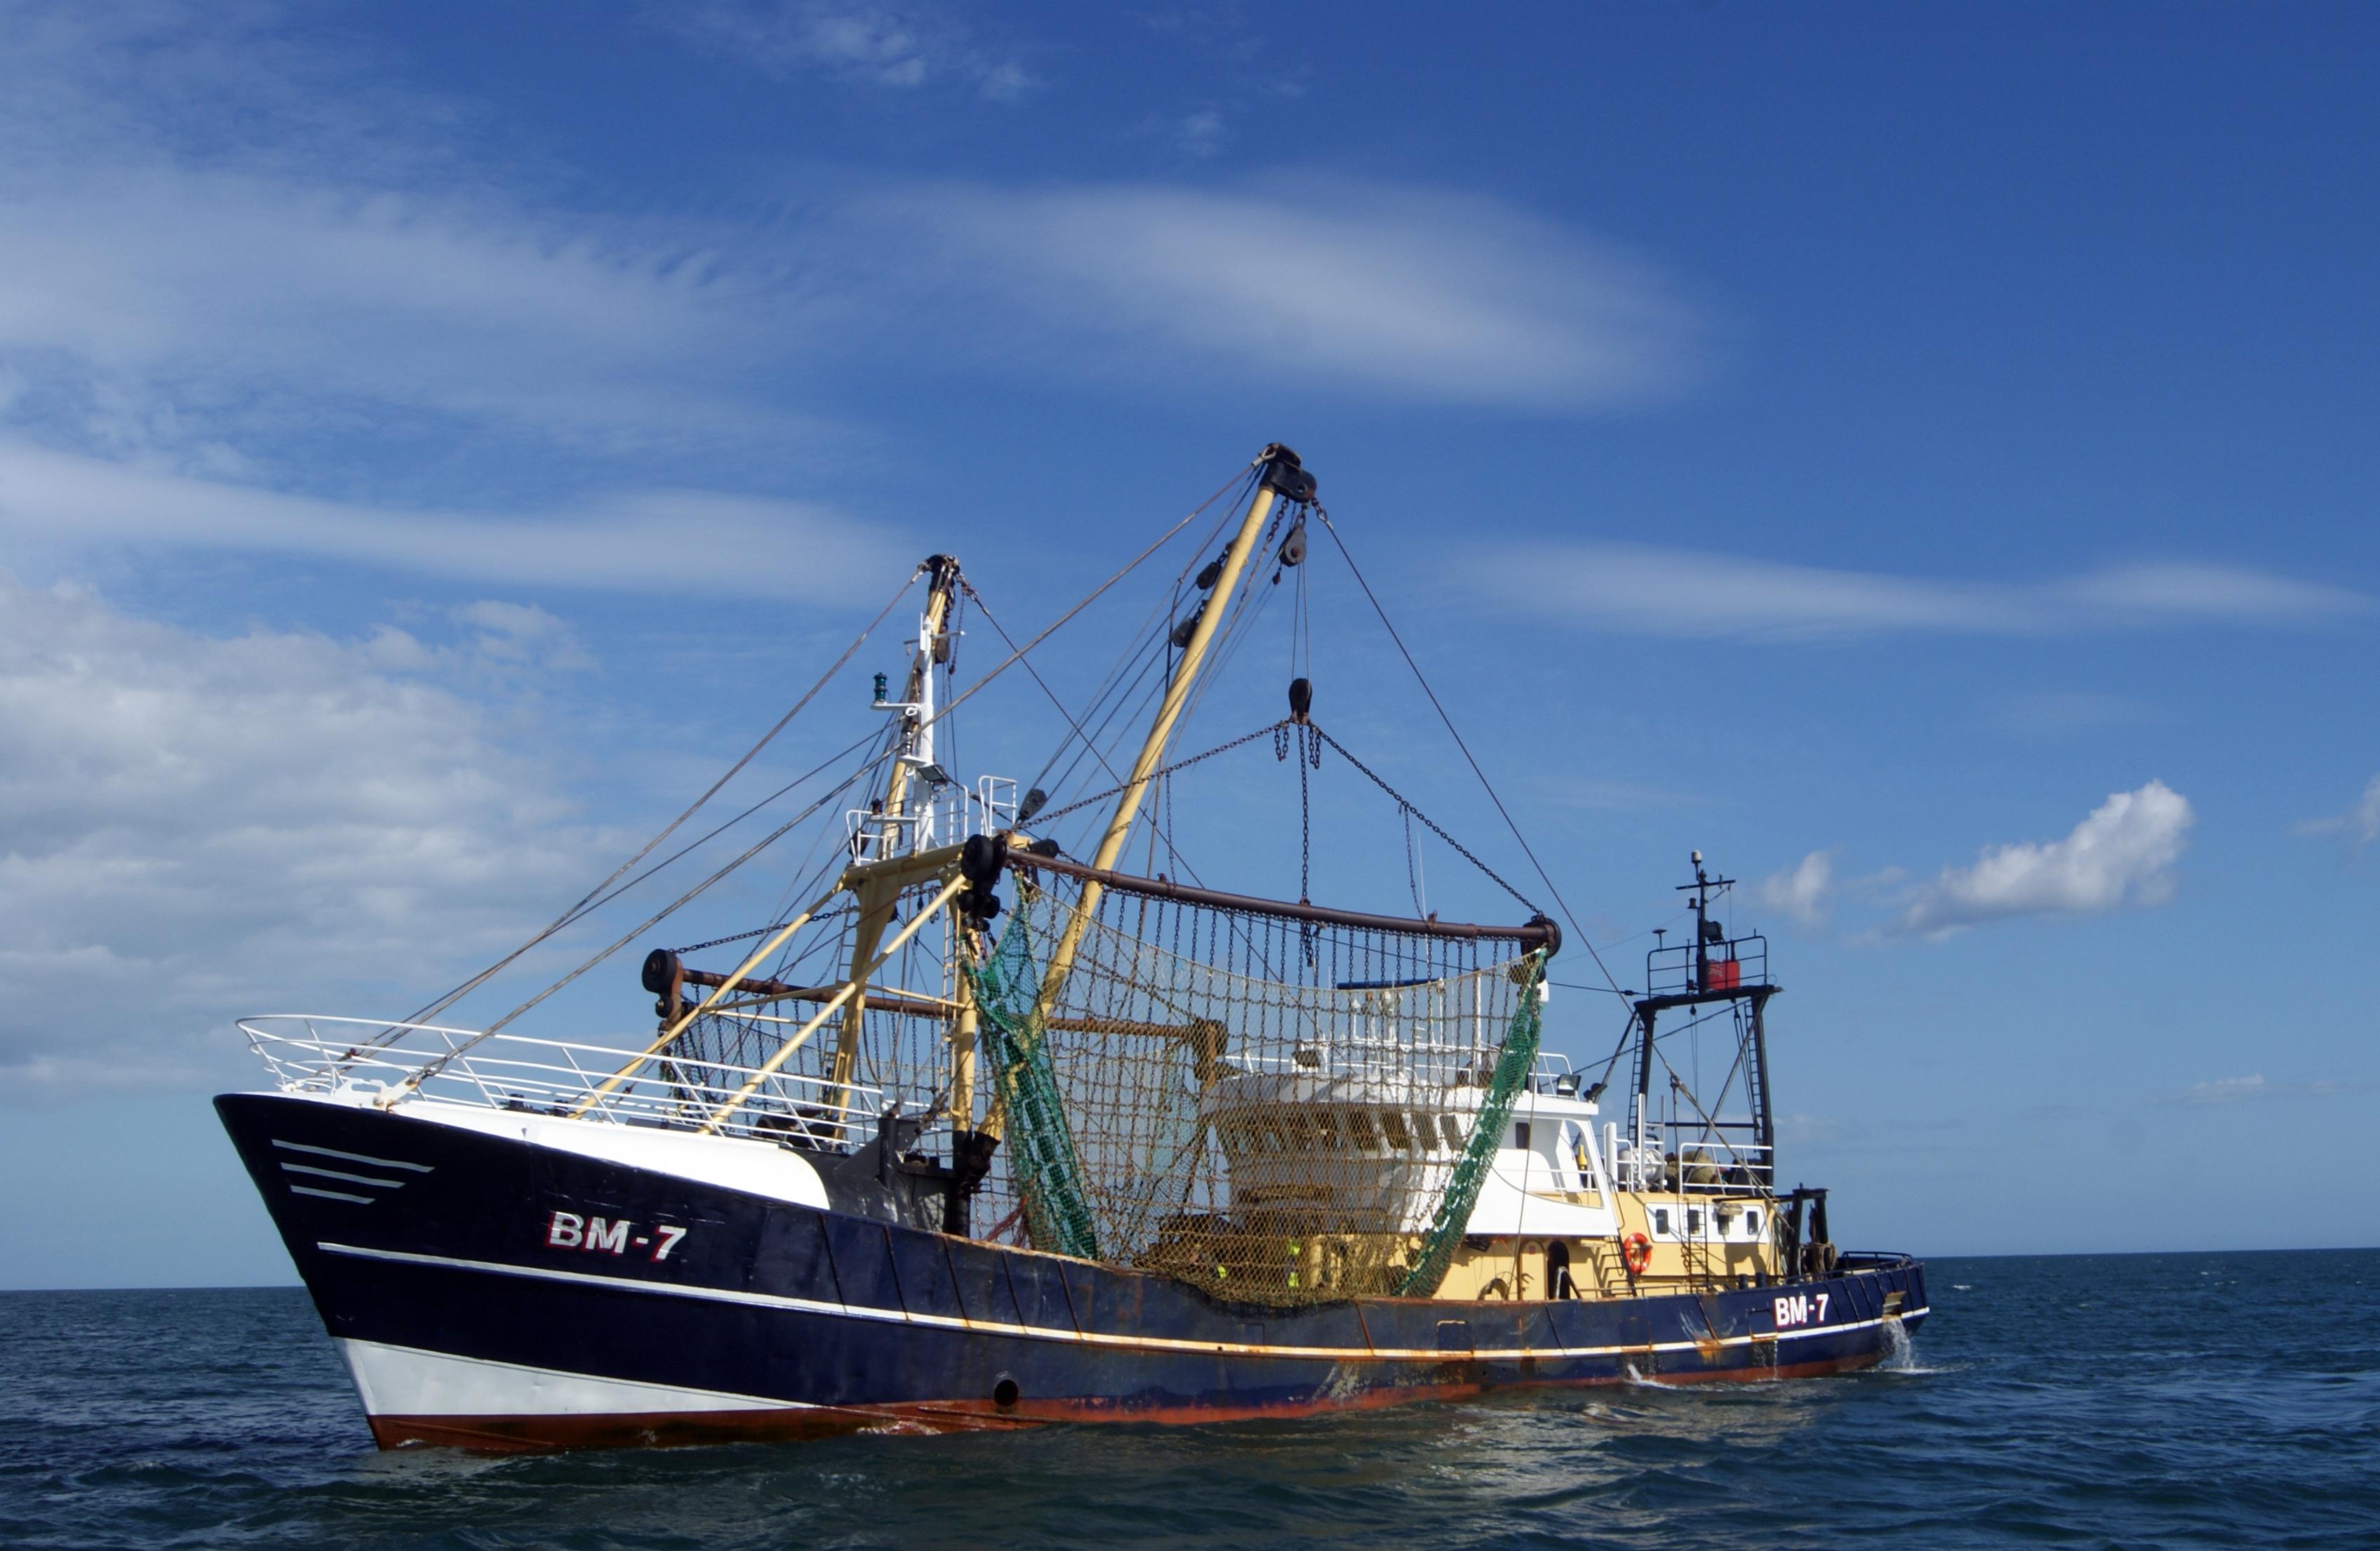 Love Wallpaper Iphone X Free Stock Photo Of Boat Fishing Ocean